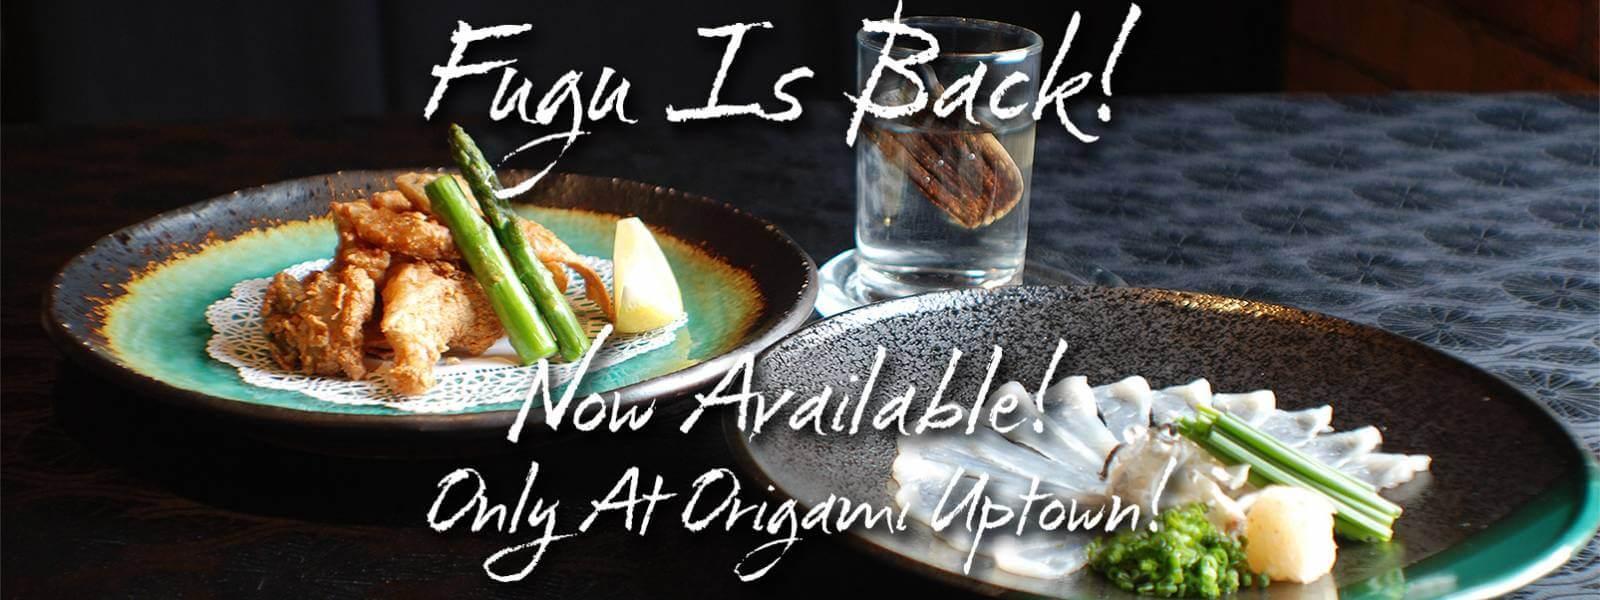 Fugu (Blowfish) at Origami Uptown